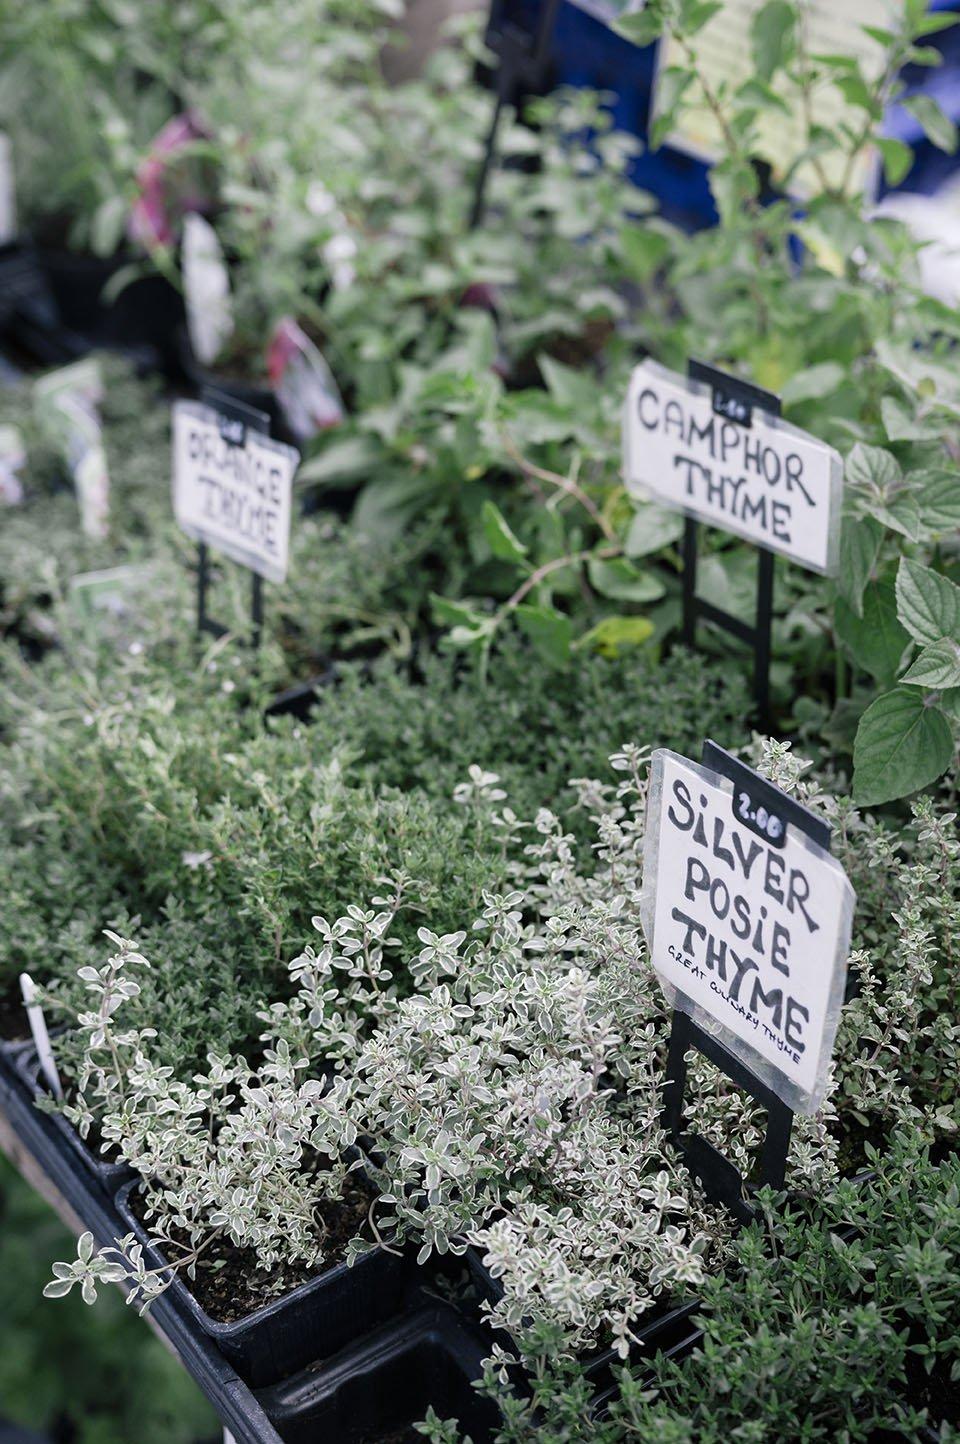 urban village fete plants growing herbs